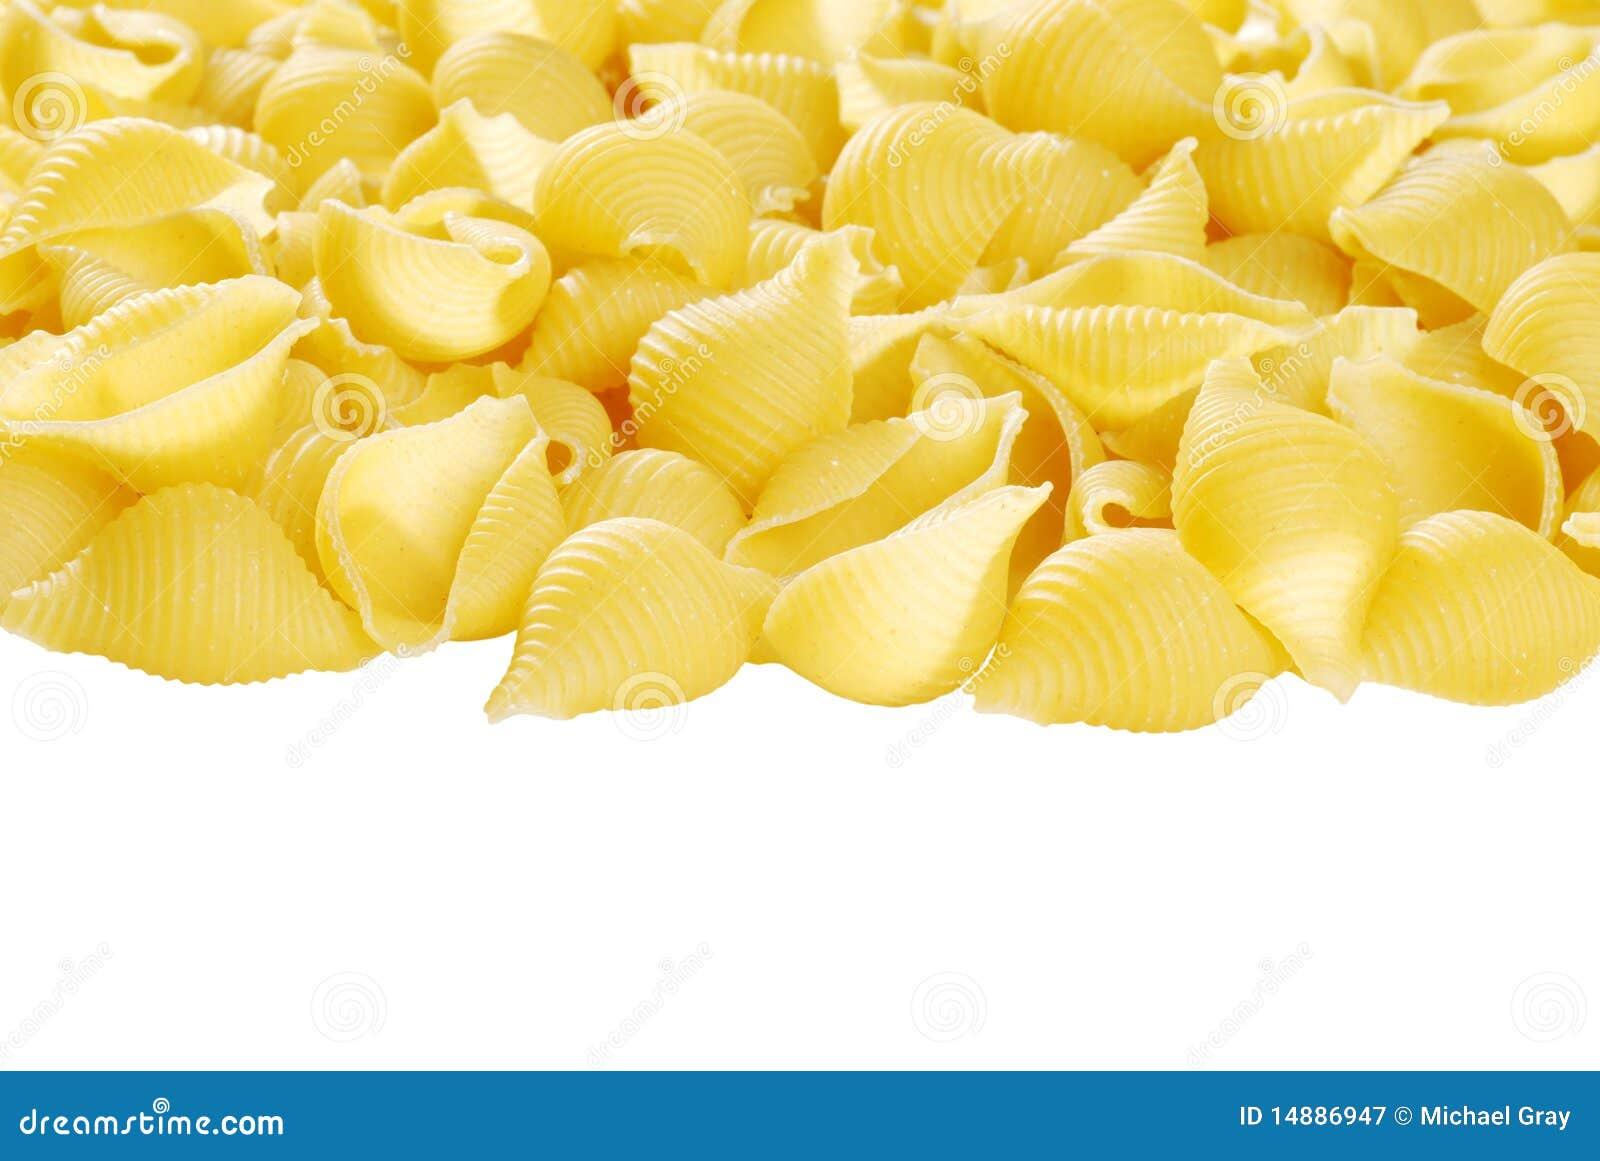 Pastas aisladas del shell